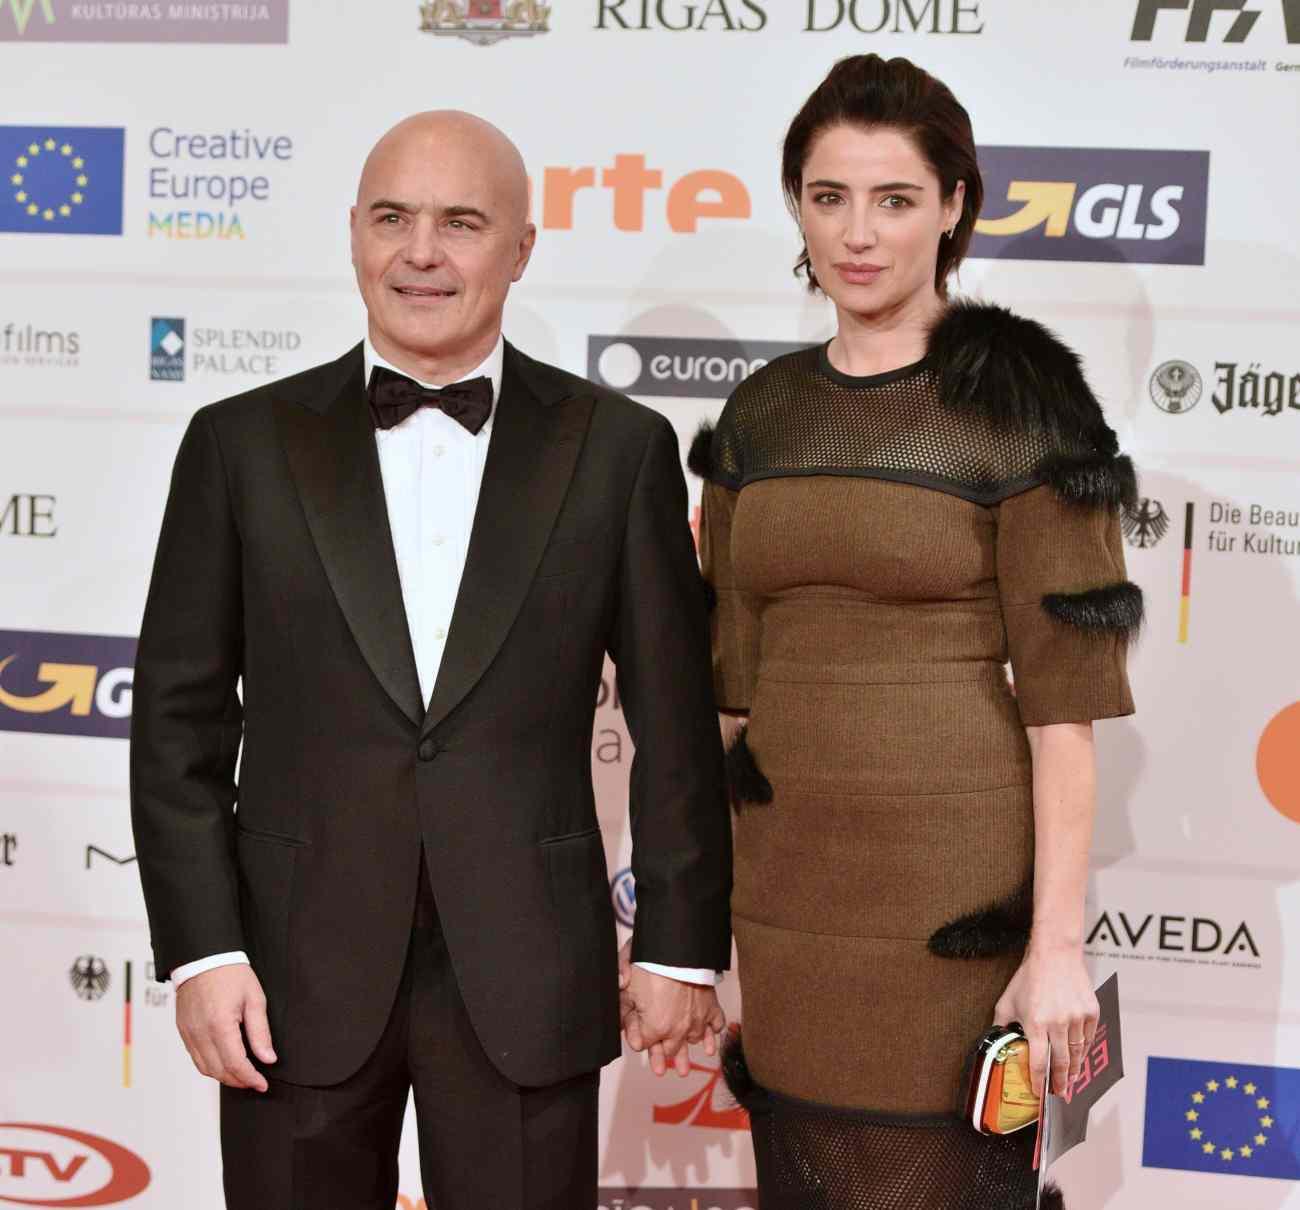 Luisa Ranieri marito Luca Zingaretti